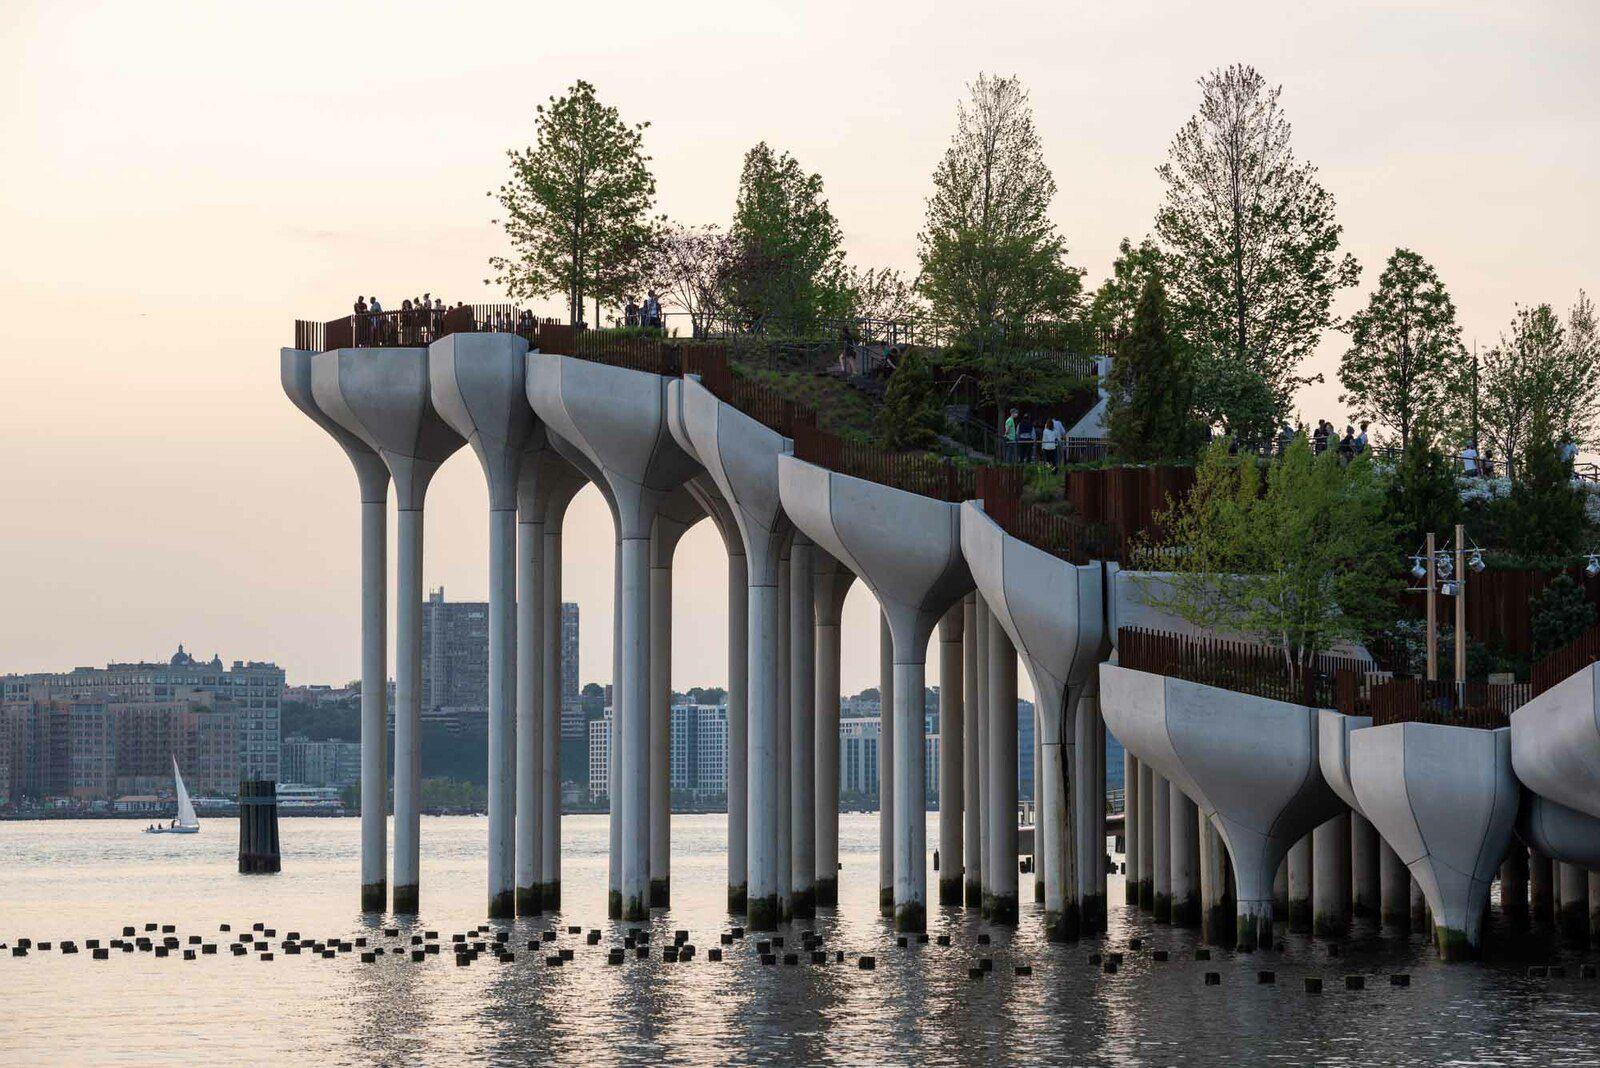 DISCOVER, LITTLE ISLAND IN NEW YORK CITY, DESIGNED BY HEATHERWICK STUDIO